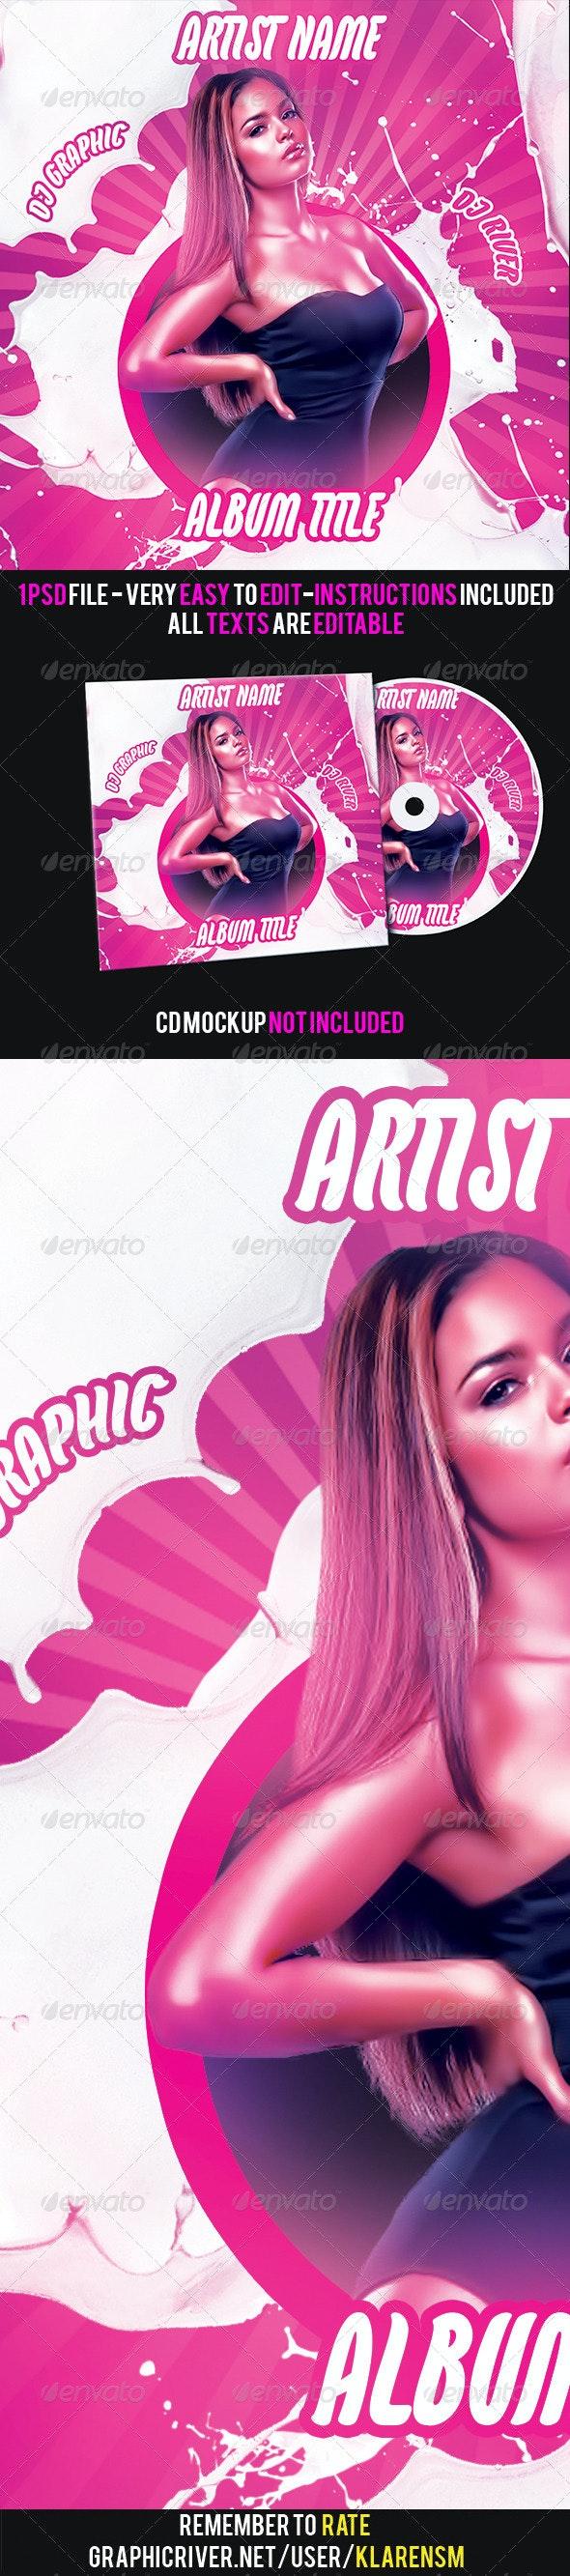 Pink Girl Mixtape Album CD Cover Template - CD & DVD Artwork Print Templates